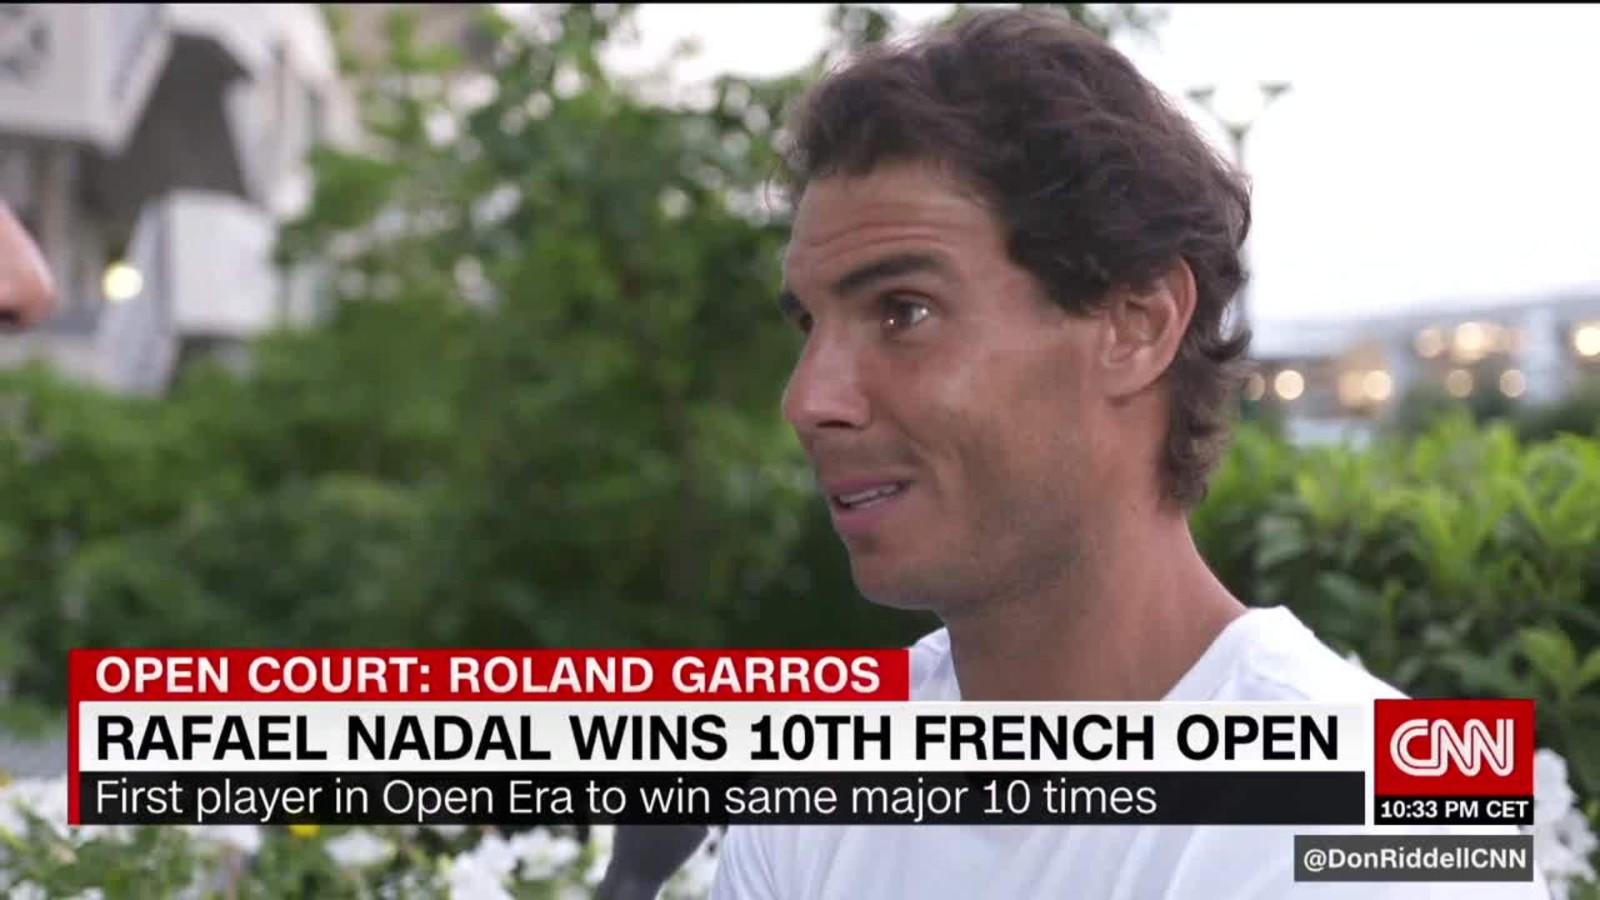 Rafael nadal wallpaper 31 34 male players hd backgrounds - Rafael Nadal Wallpaper 31 34 Male Players Hd Backgrounds 51